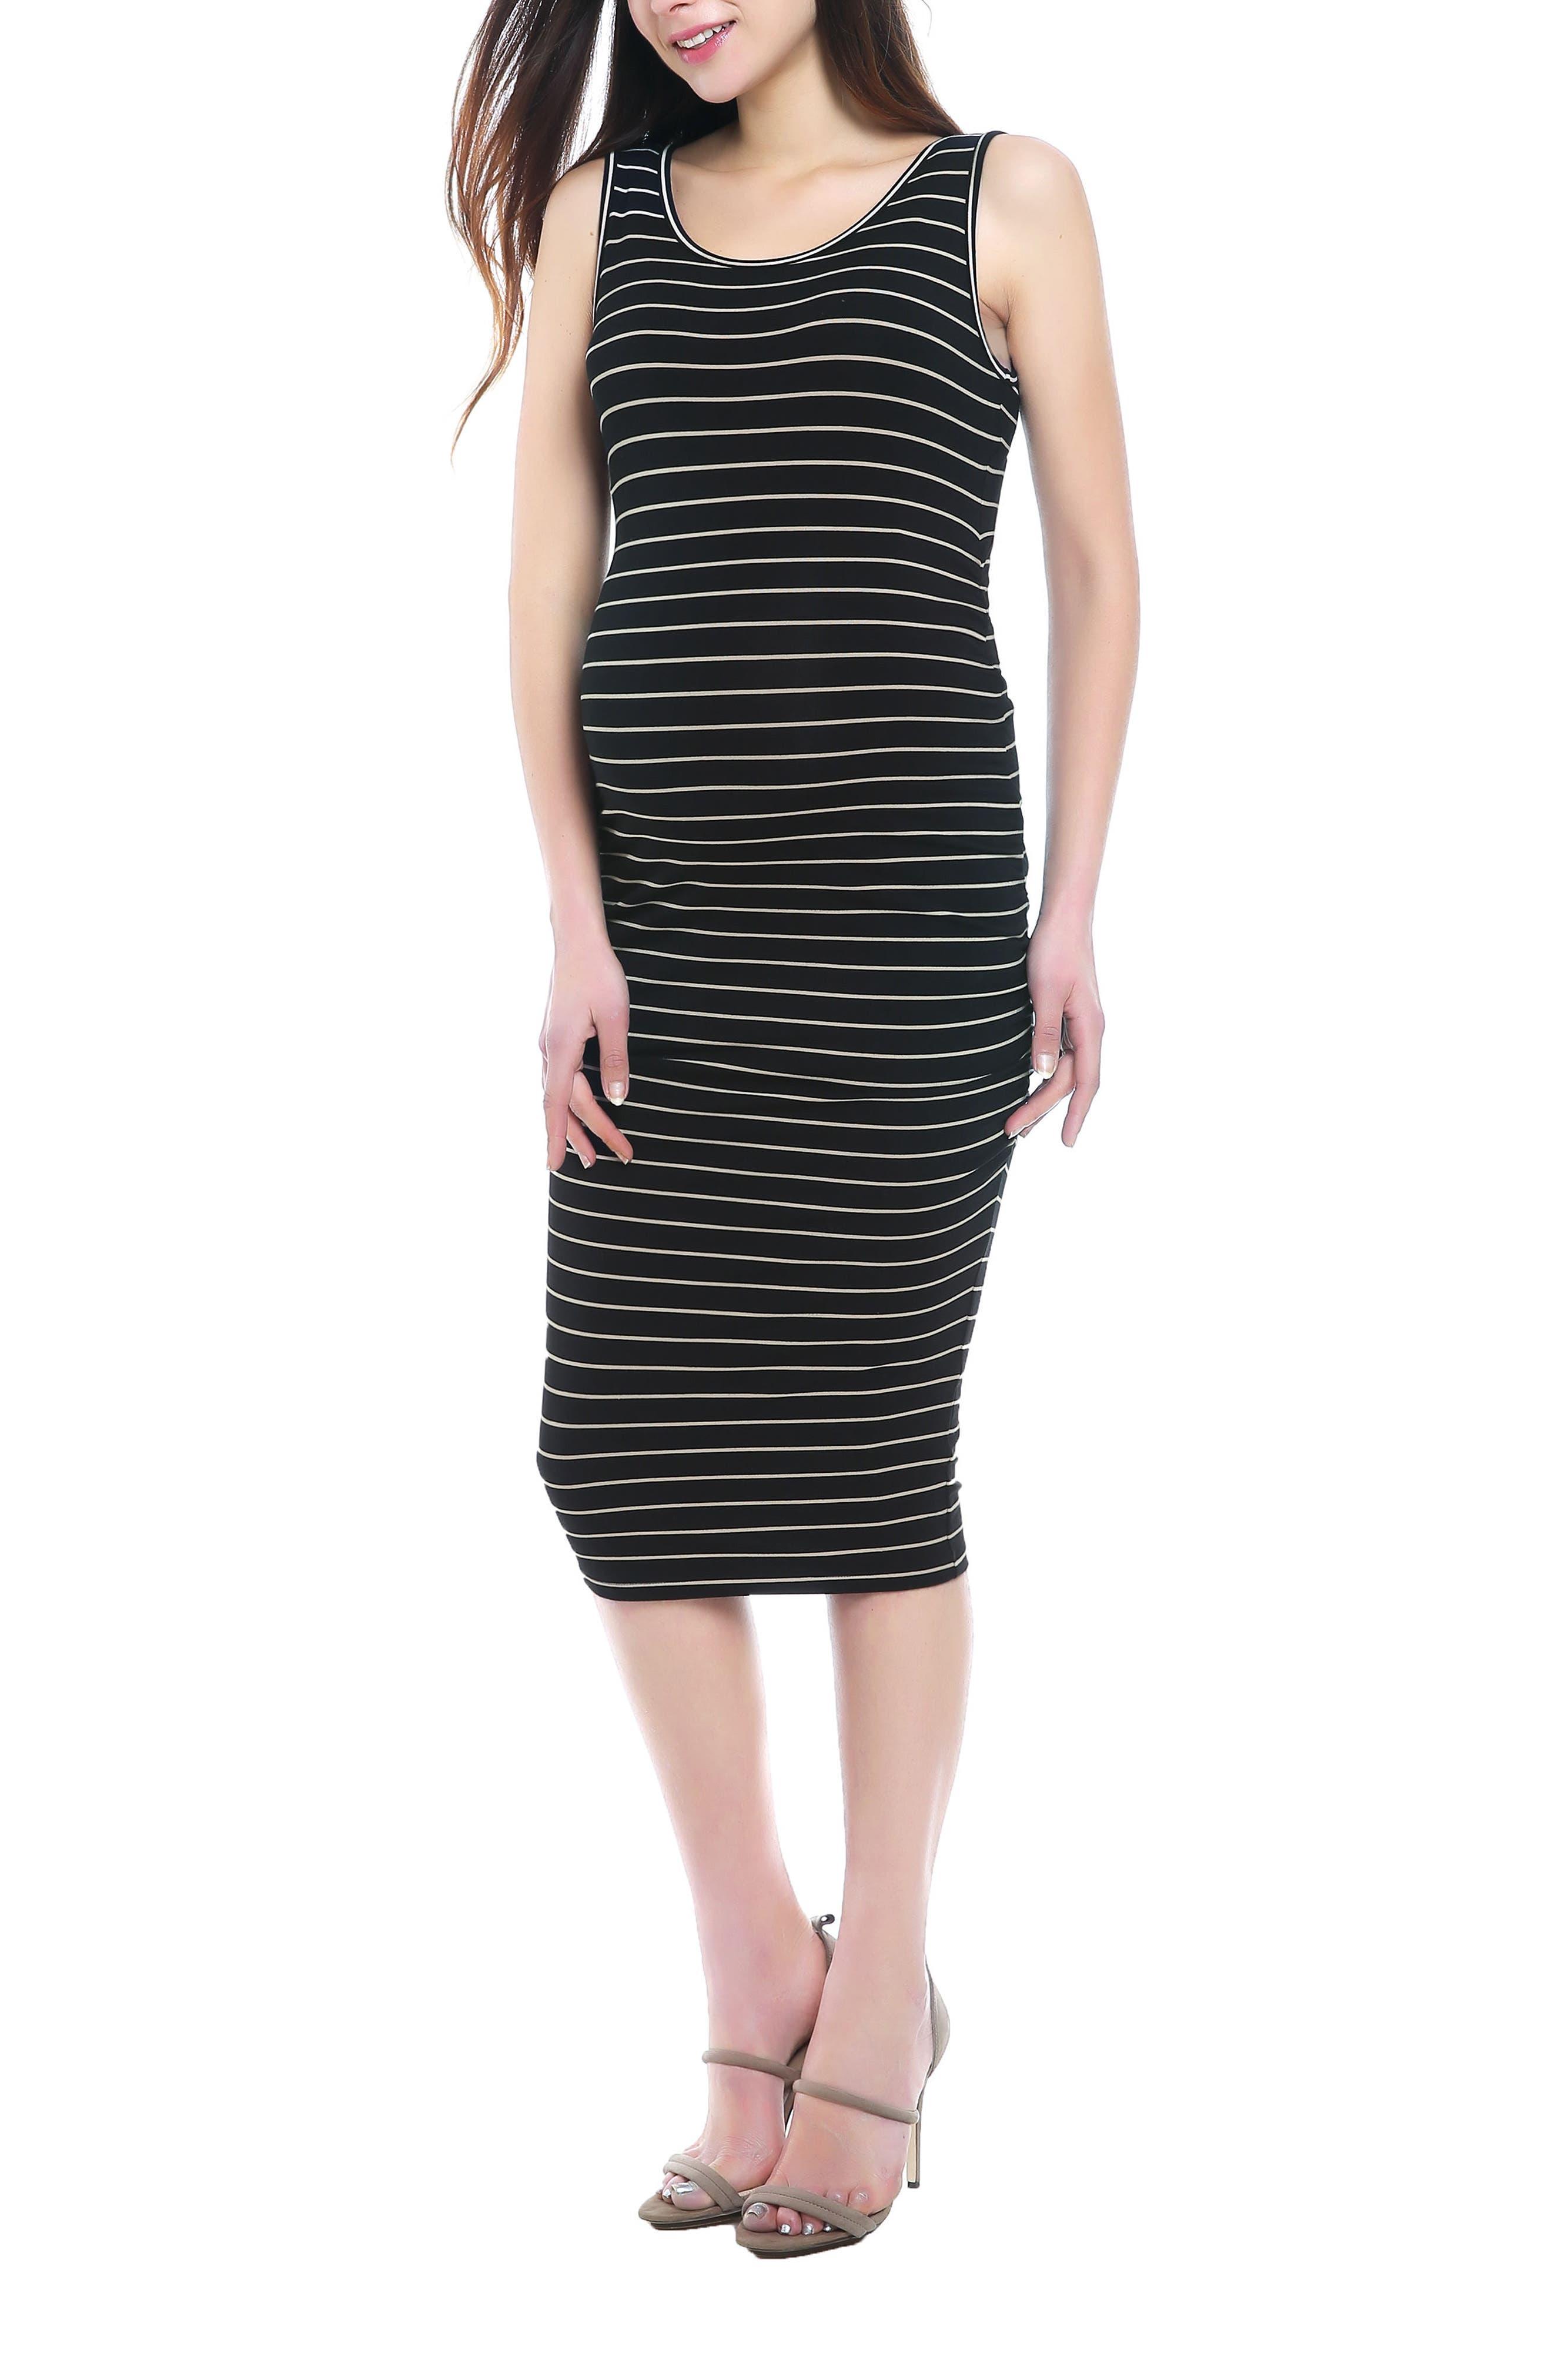 KIMI AND KAI, Tobi Stripe Maternity Dress, Alternate thumbnail 5, color, BLACK/ BEIGE